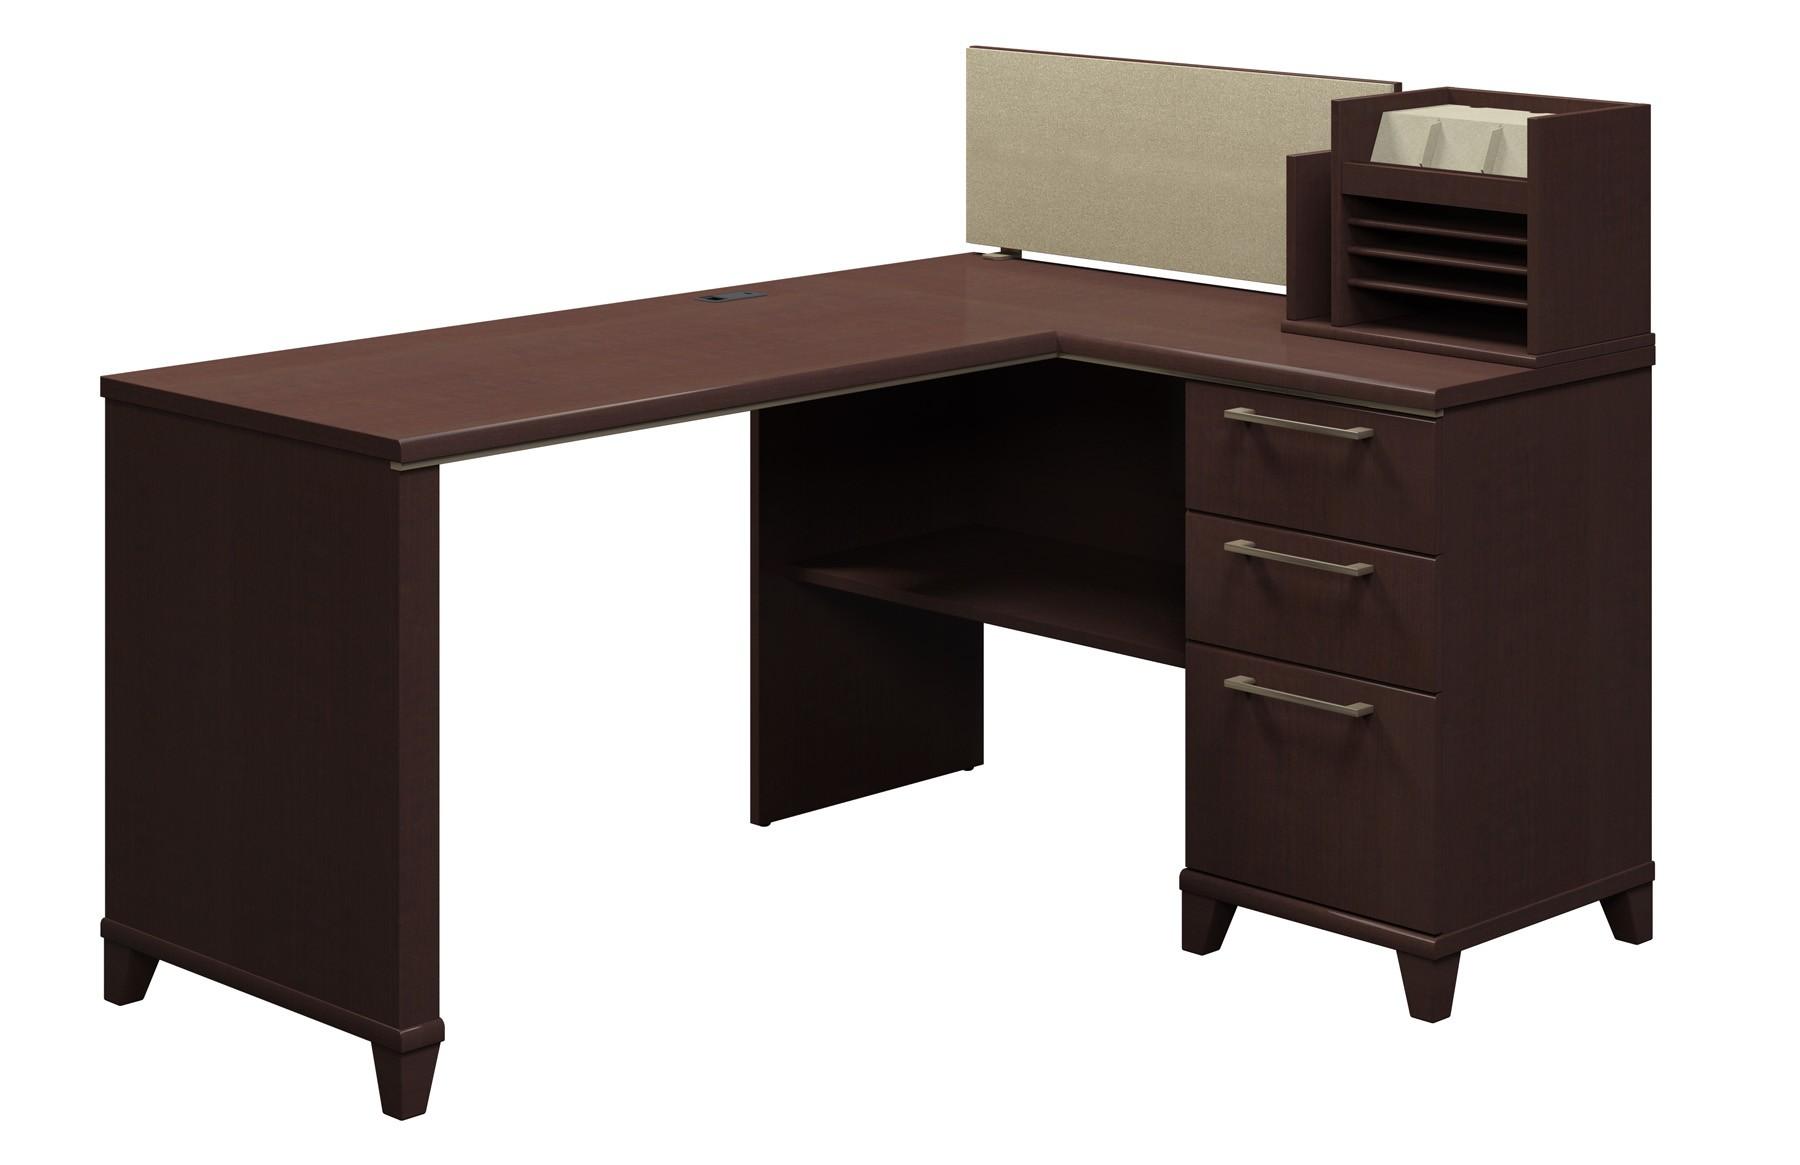 Enterprise Mocha Cherry 60 Inch Corner Desk from Bush